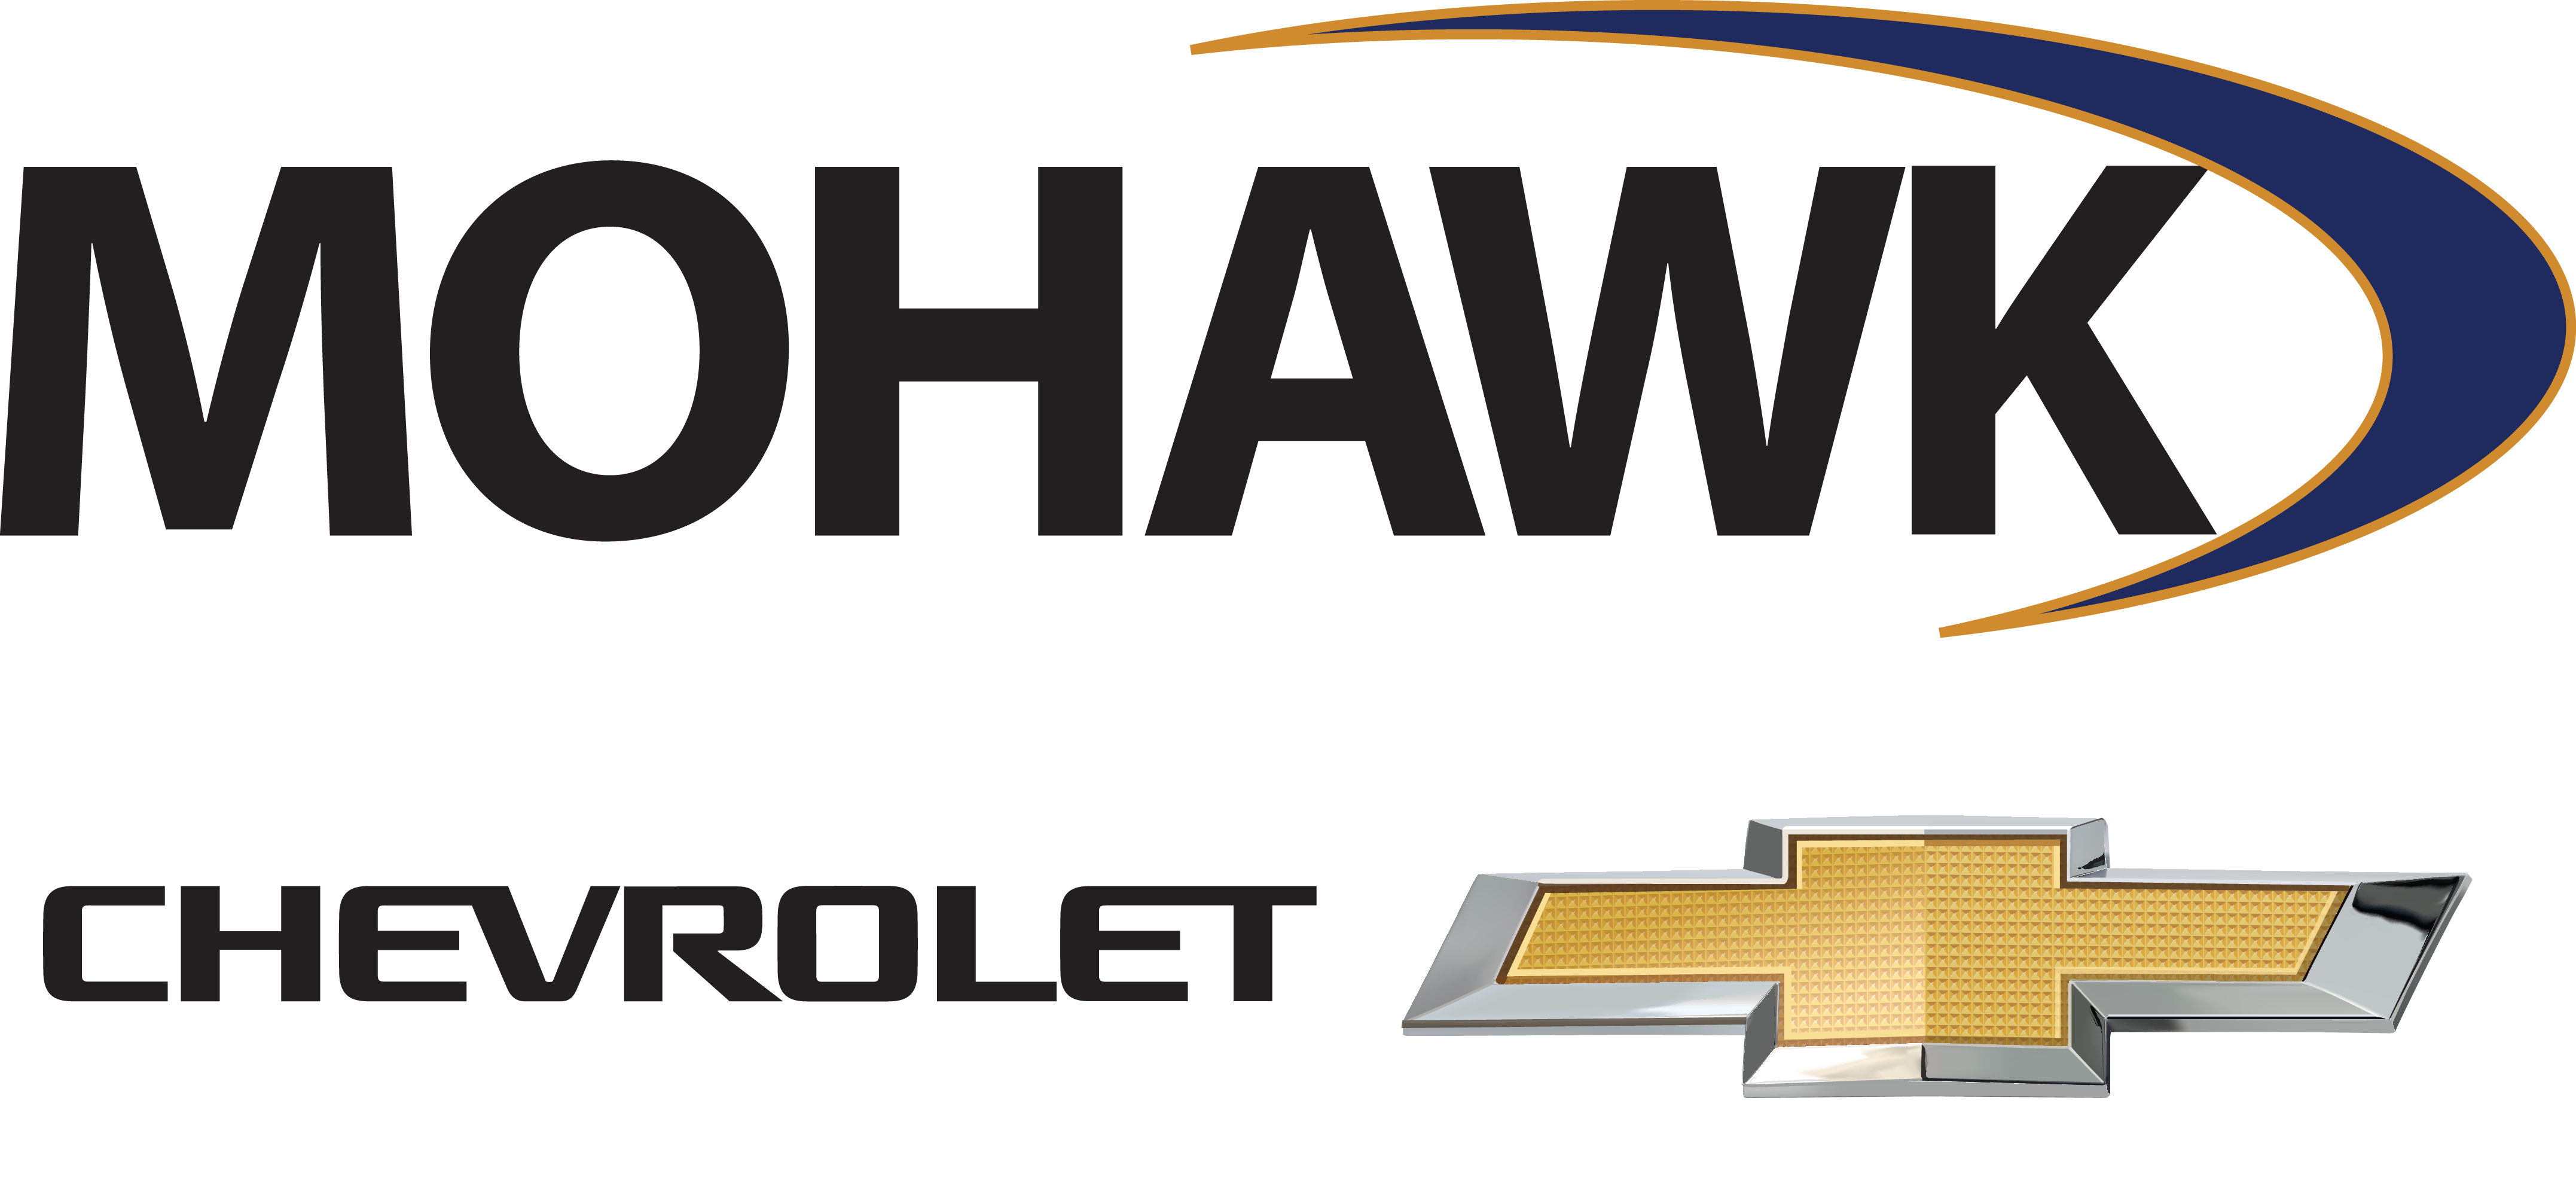 Mohawk Chevy -